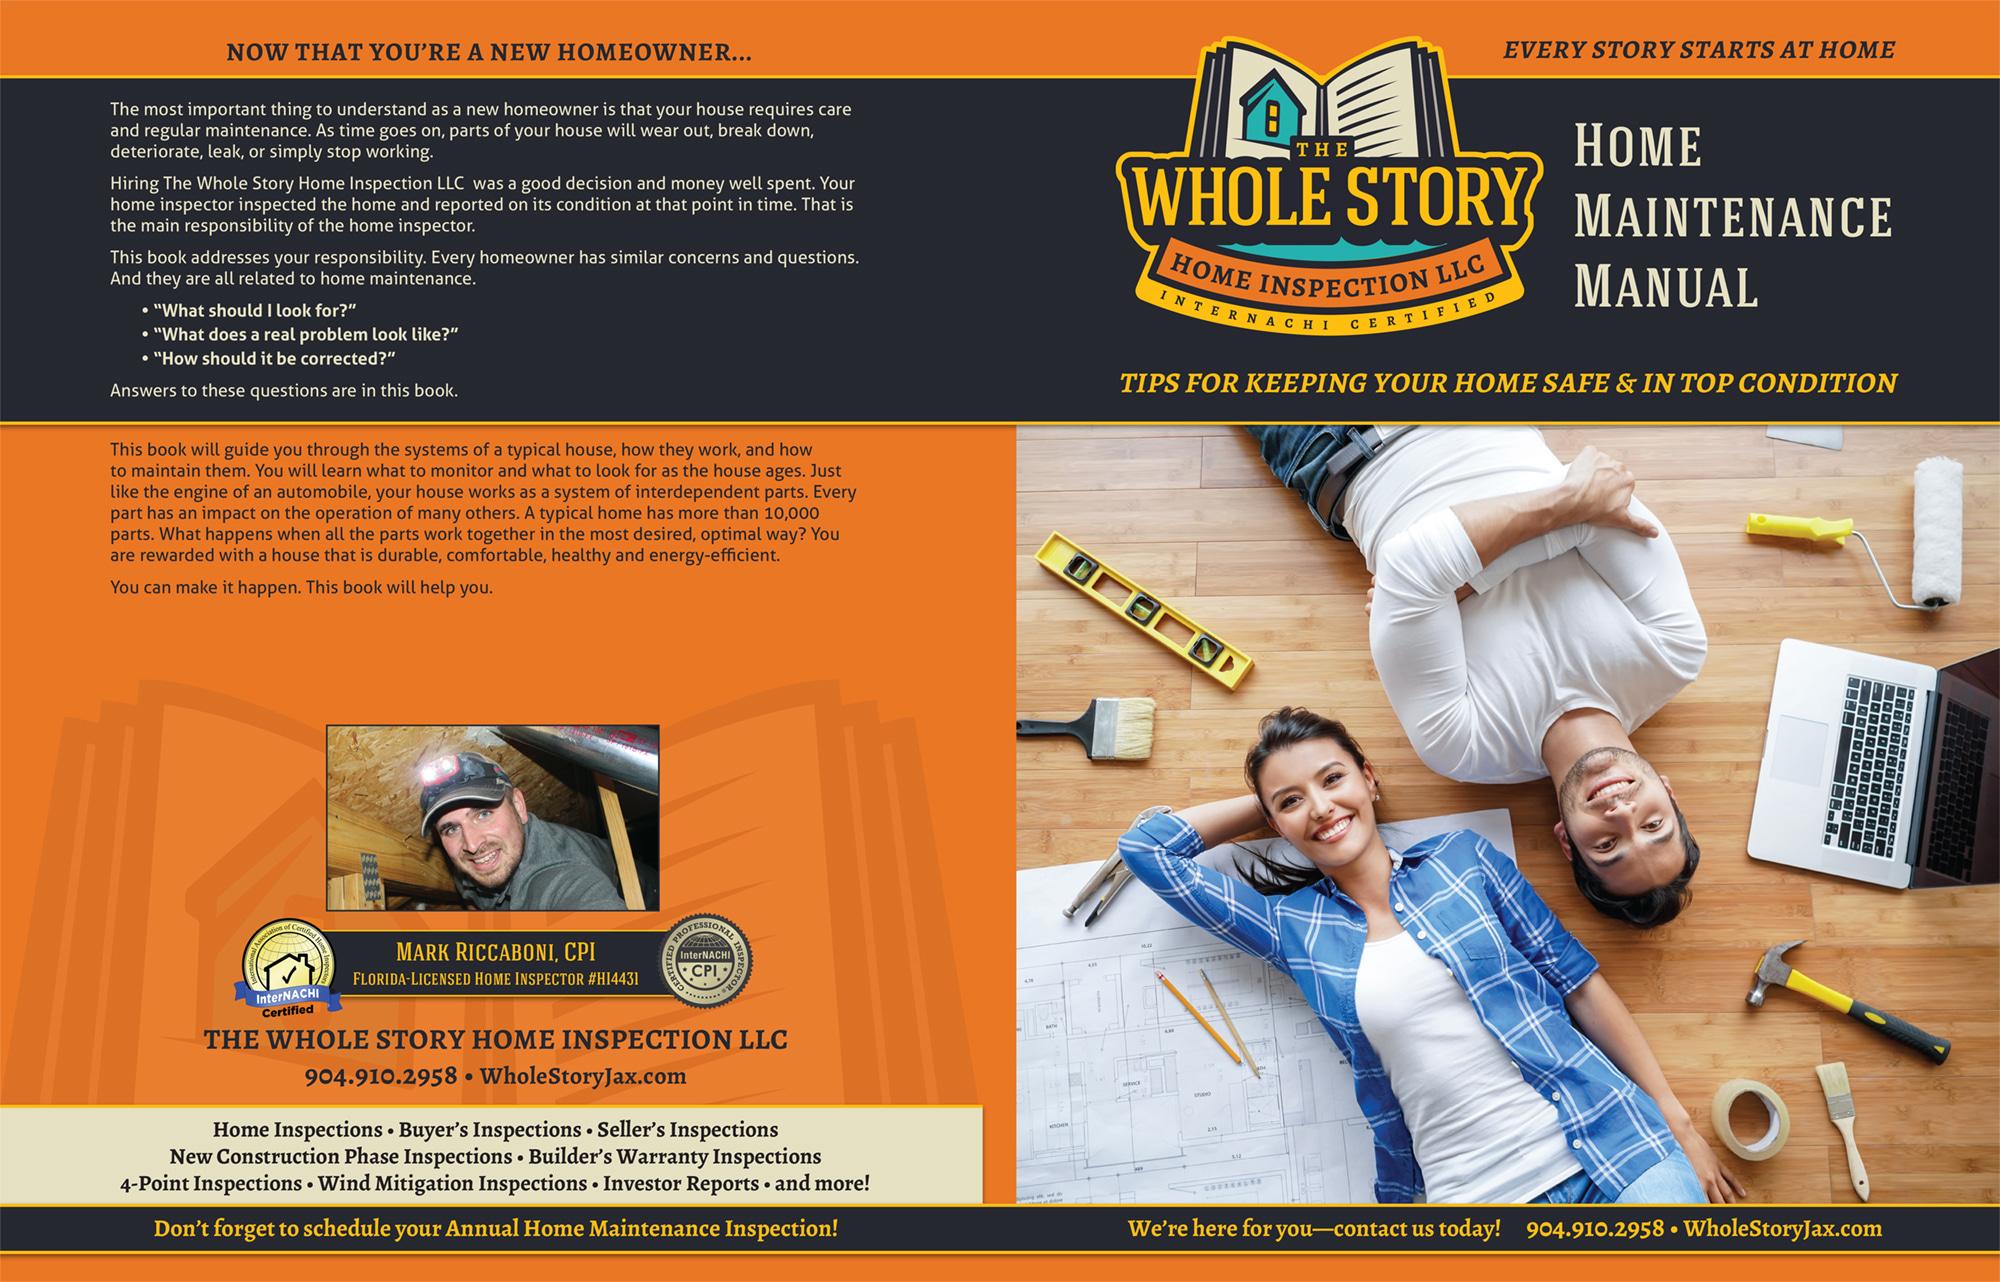 Custom Home Maintenance Books The Whole Story Home Inspection